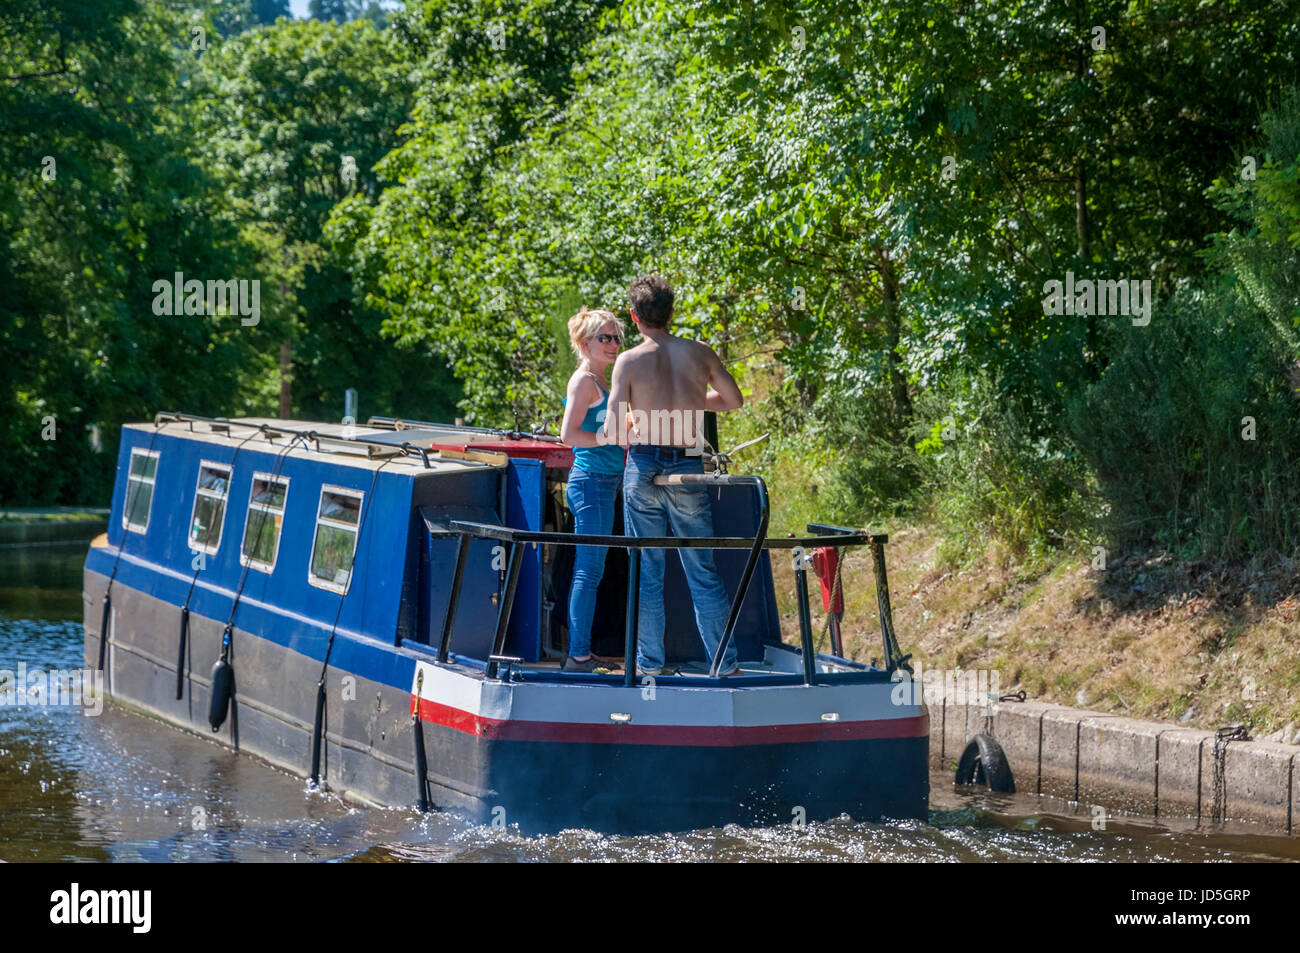 Llangollen canal narrowboat - Stock Image